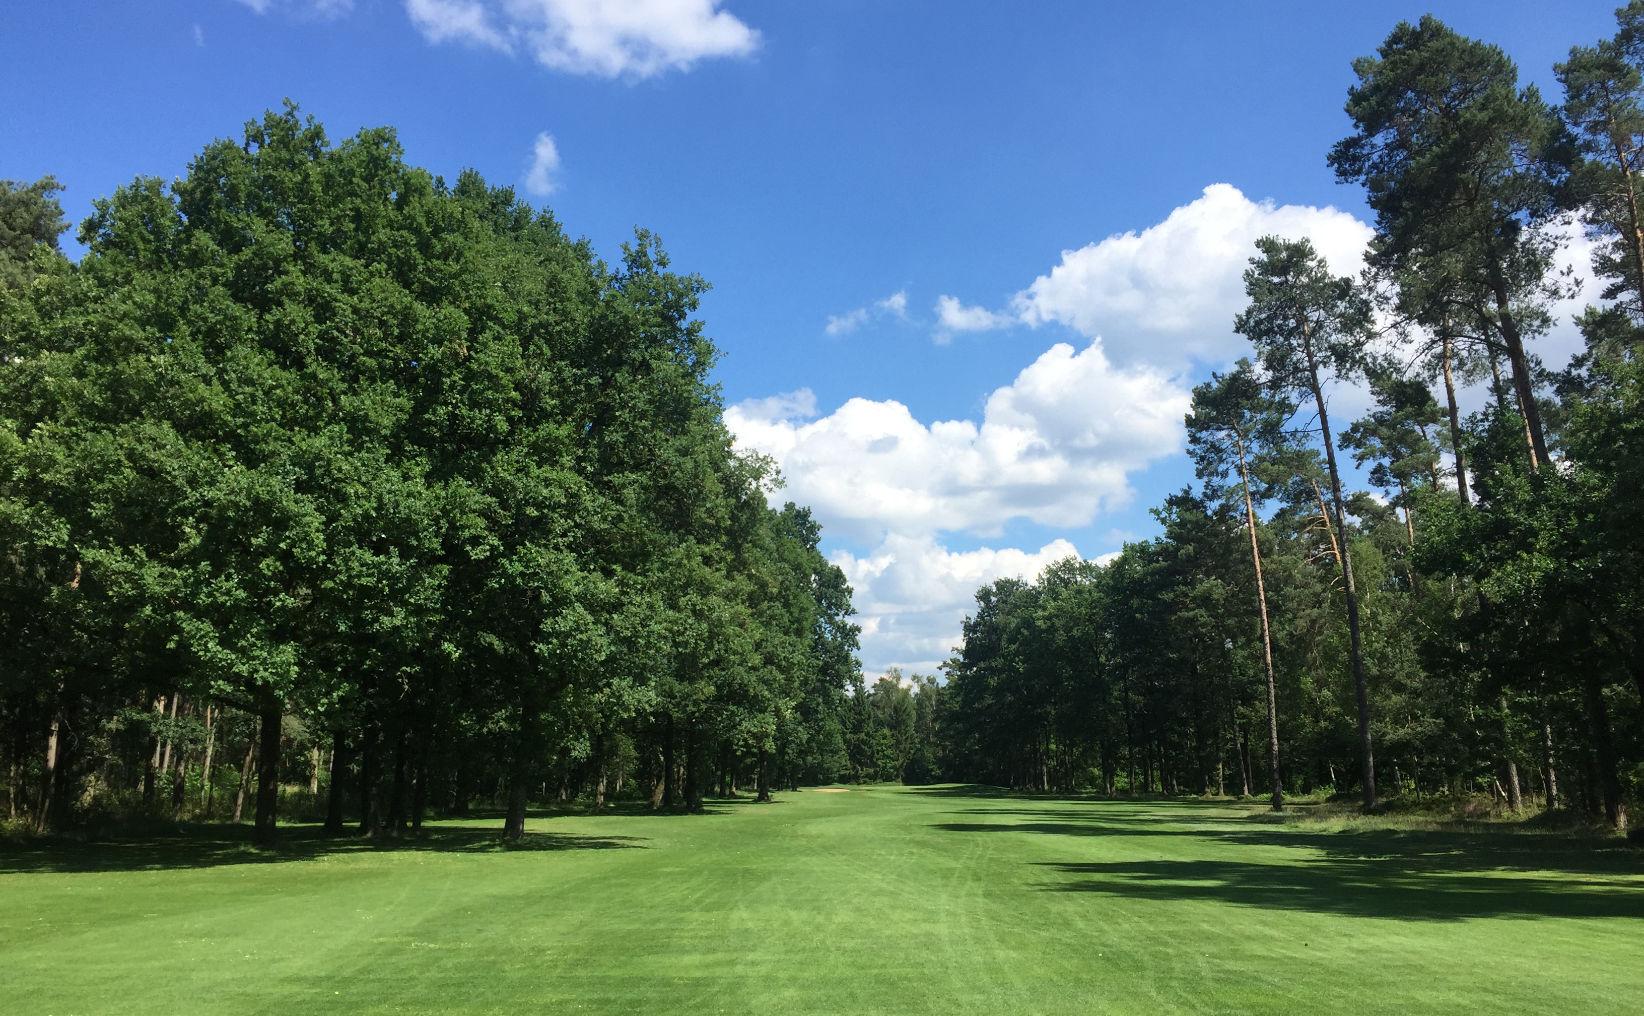 Golftraining - Schmale Golfbahn